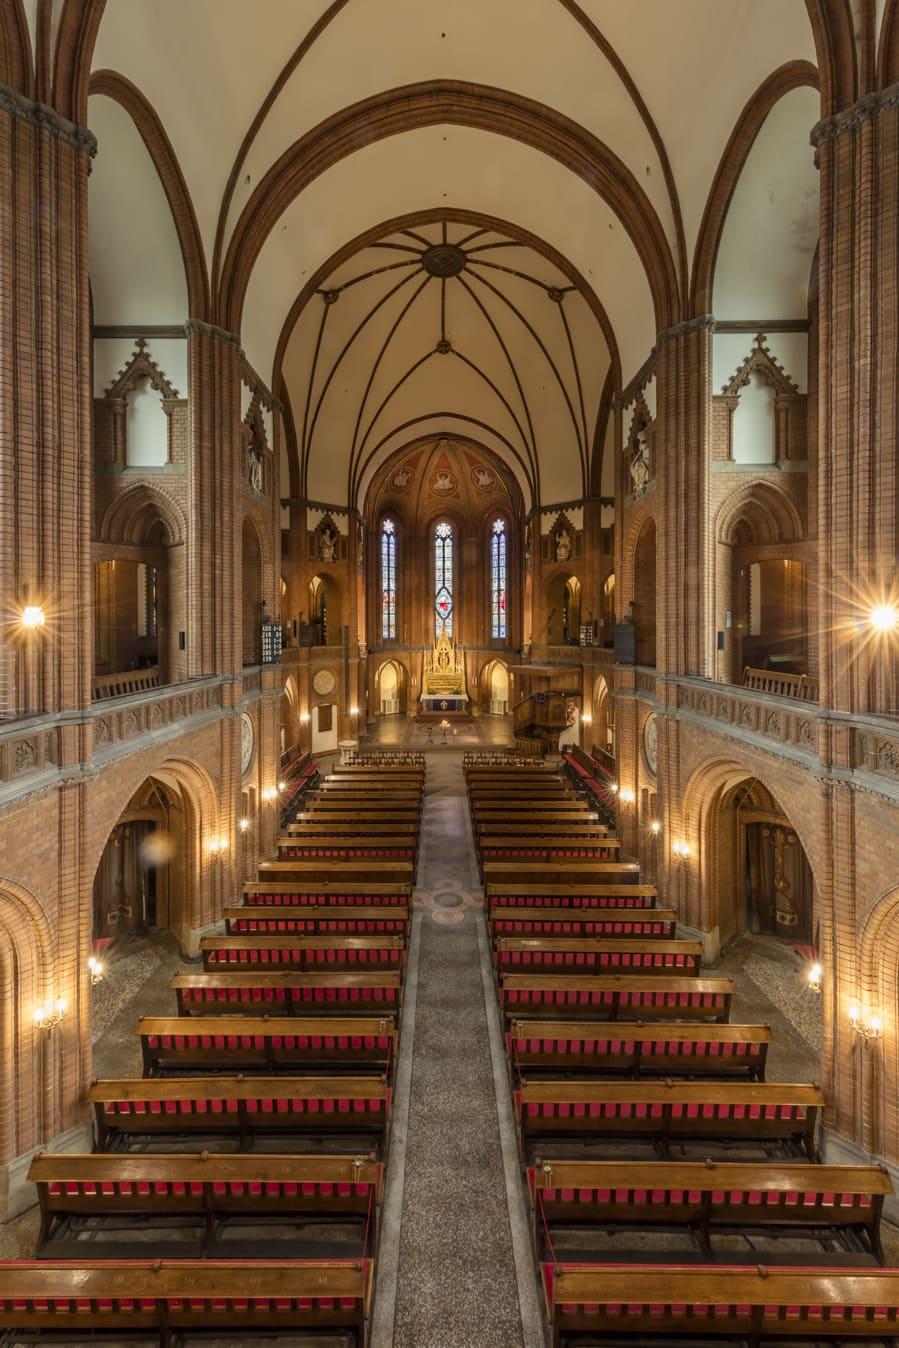 Kirche St. Johannis Harvestehude, Hamburg – Innenraum